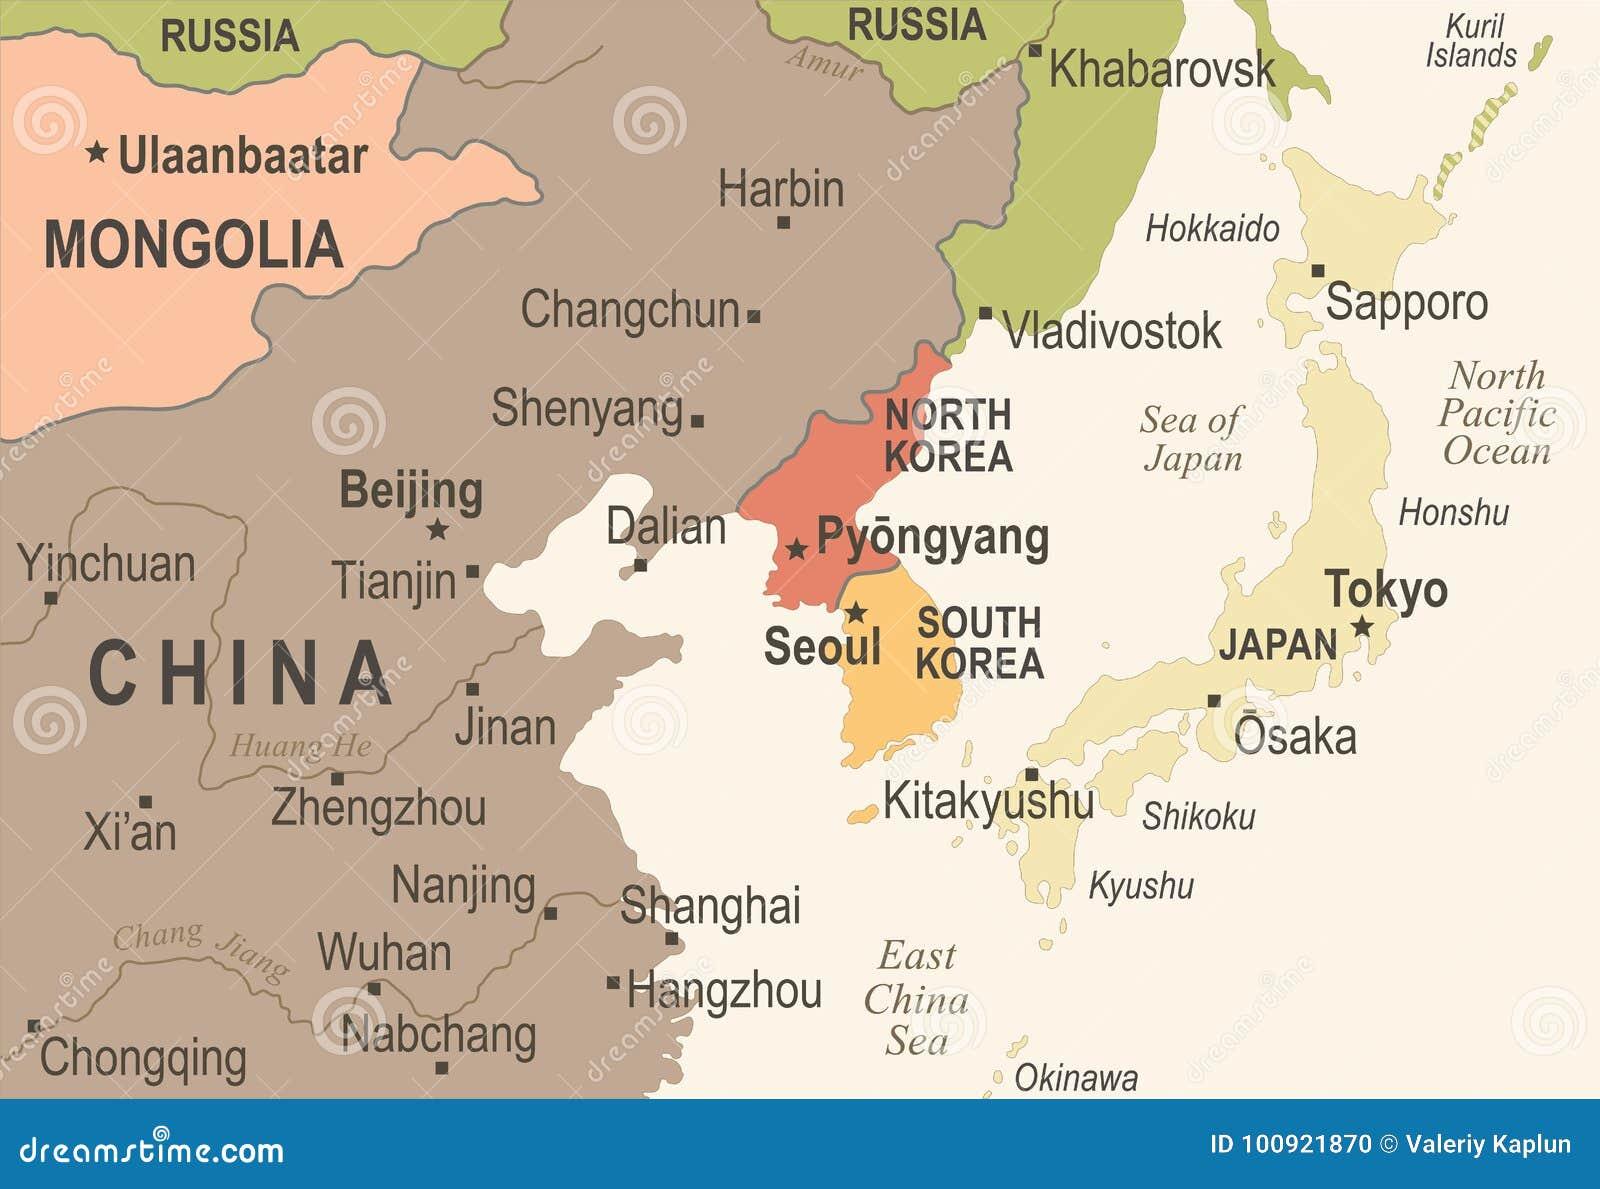 Karte Nordkoreas Südkorea Japan China Russland Mongolei - Weinlese-Vektor-Illustration